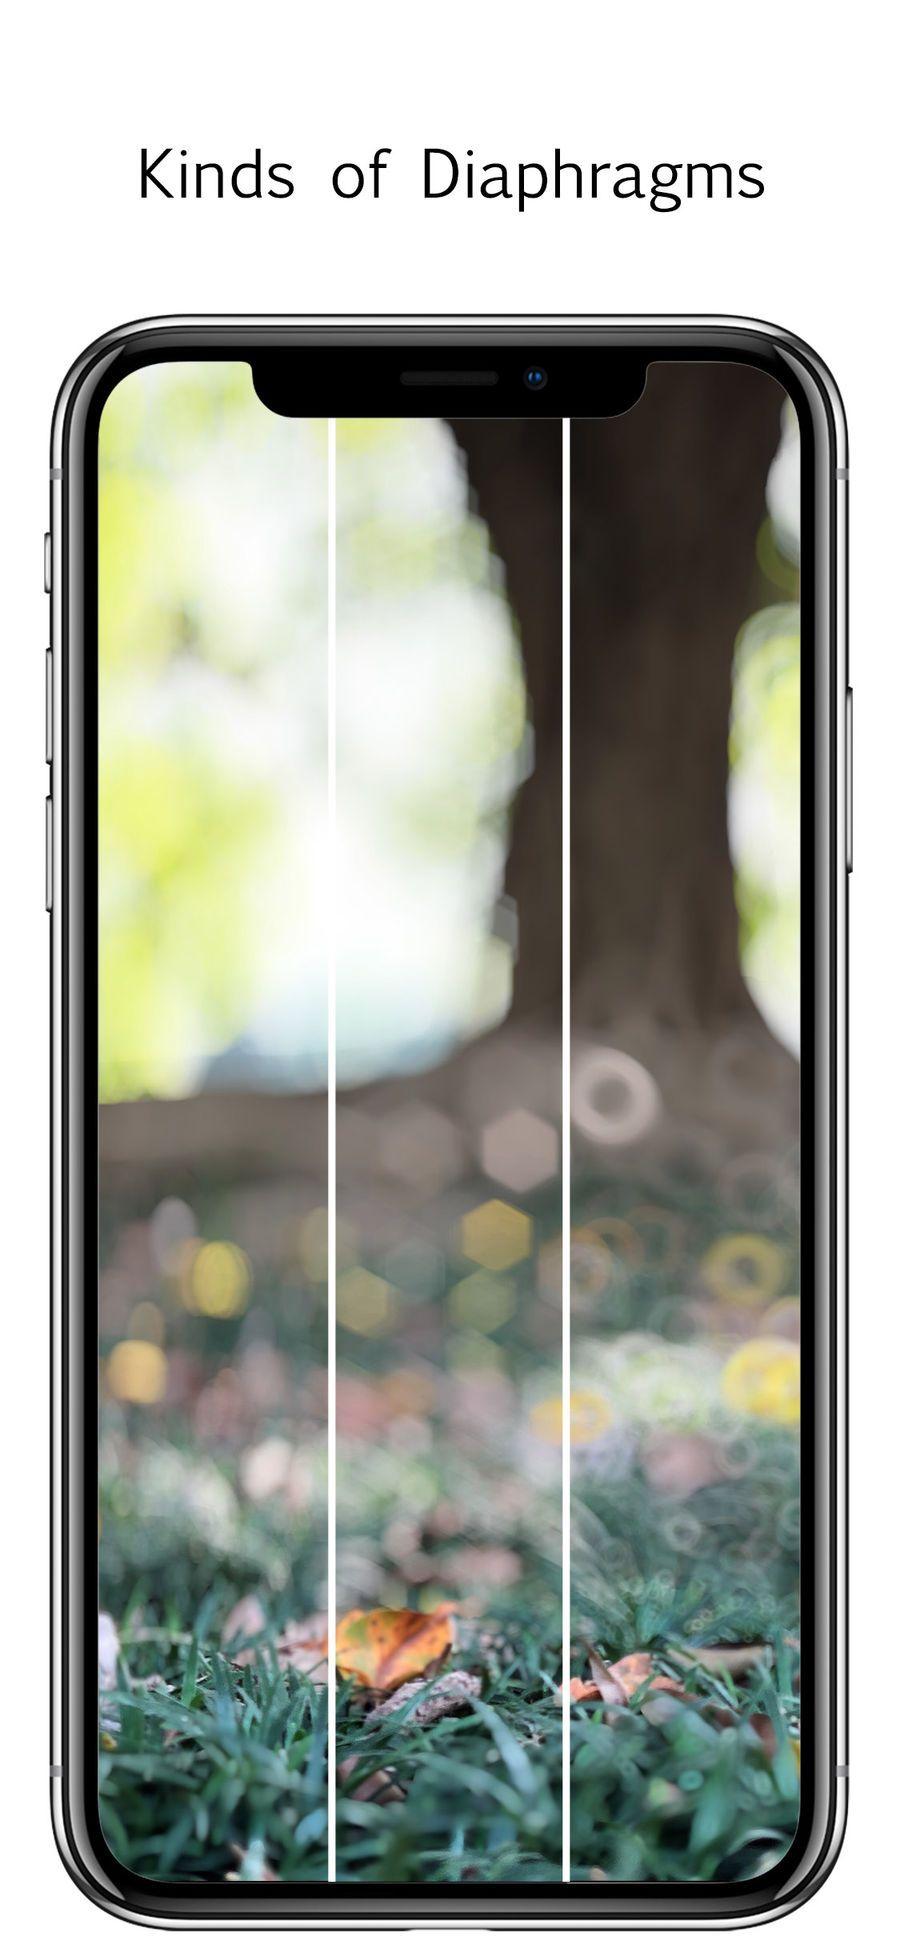 Focos Video Amp Apps Ios Ios Games Android Ios